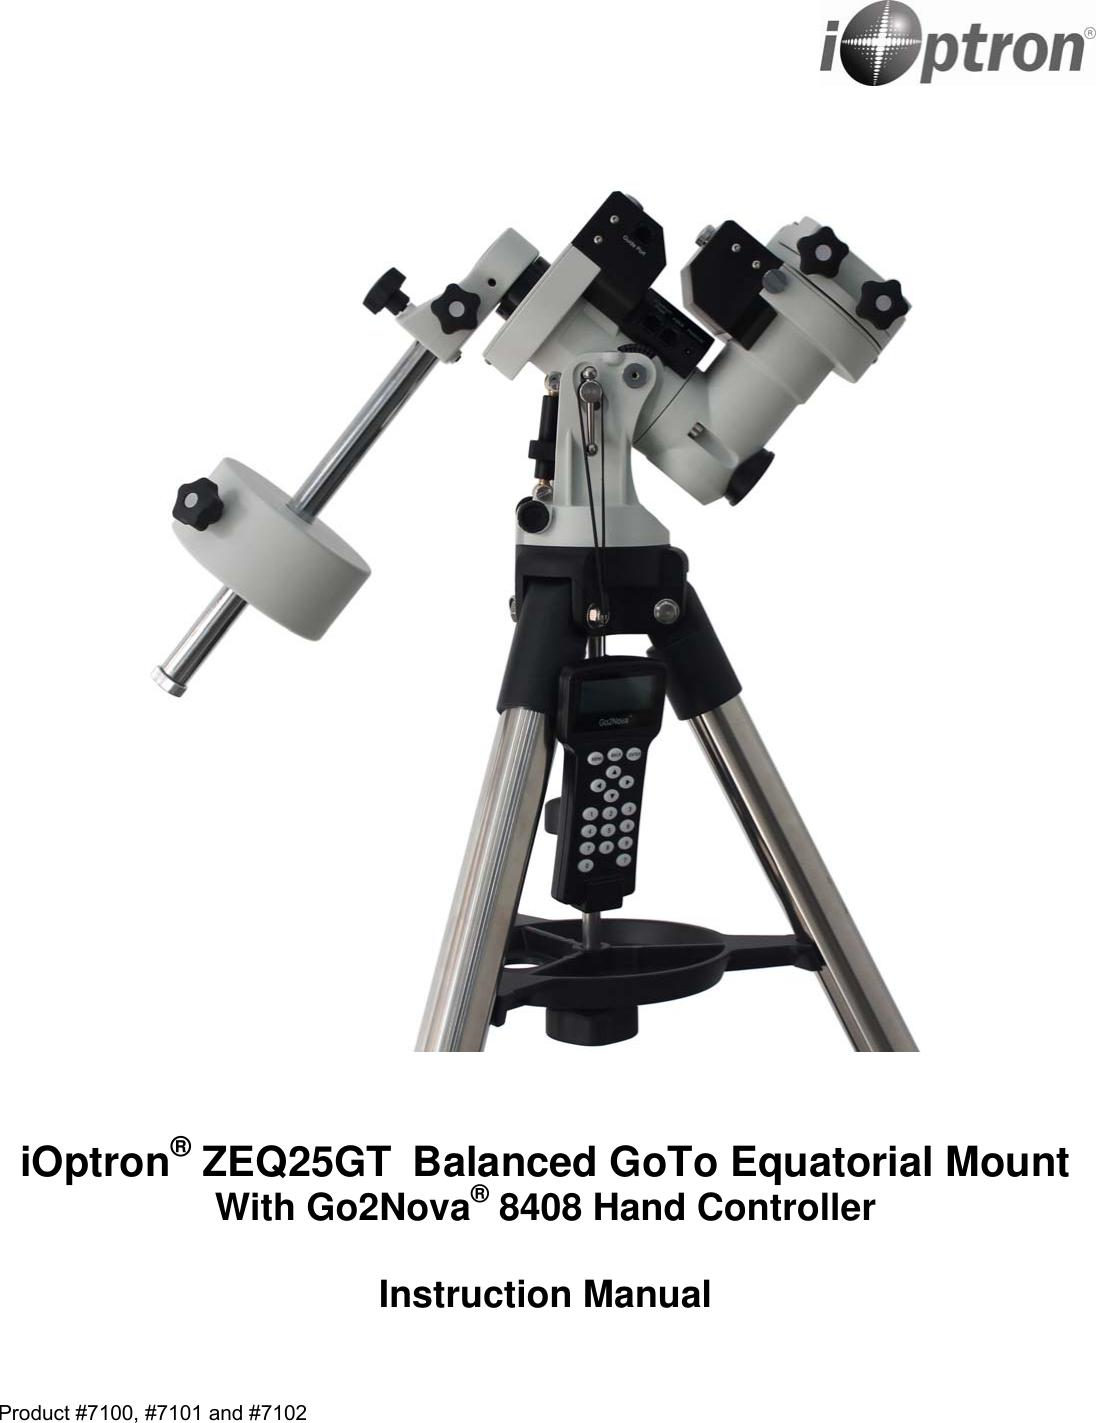 IOptron ZEQ25GT ZEQ25 Manual V12 User To The E1b4bb06 c0ec